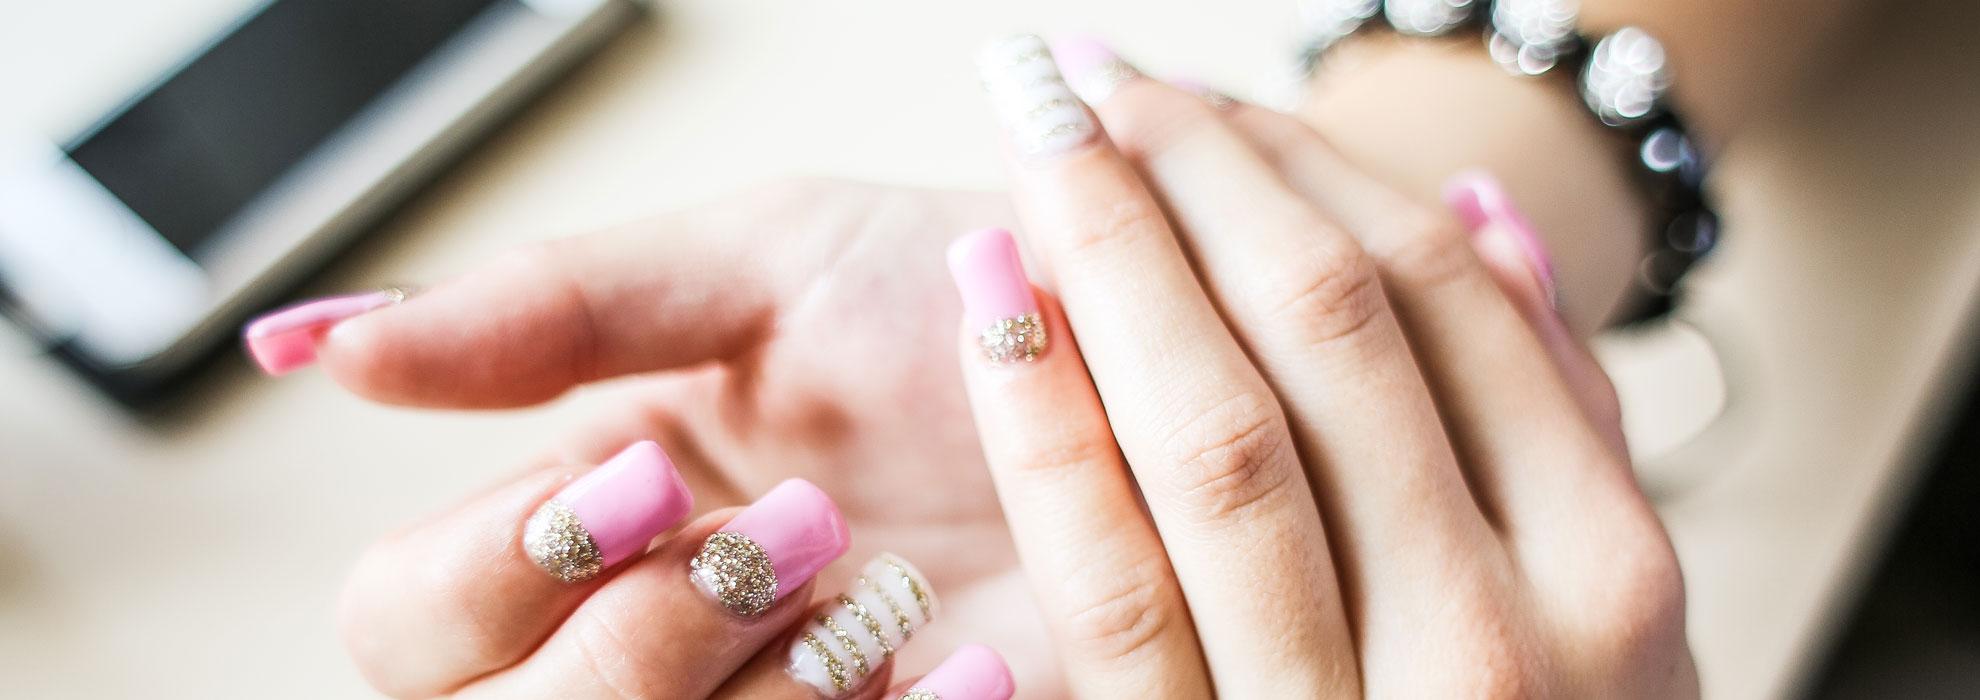 girl-nail-art-design-picjumbo-com